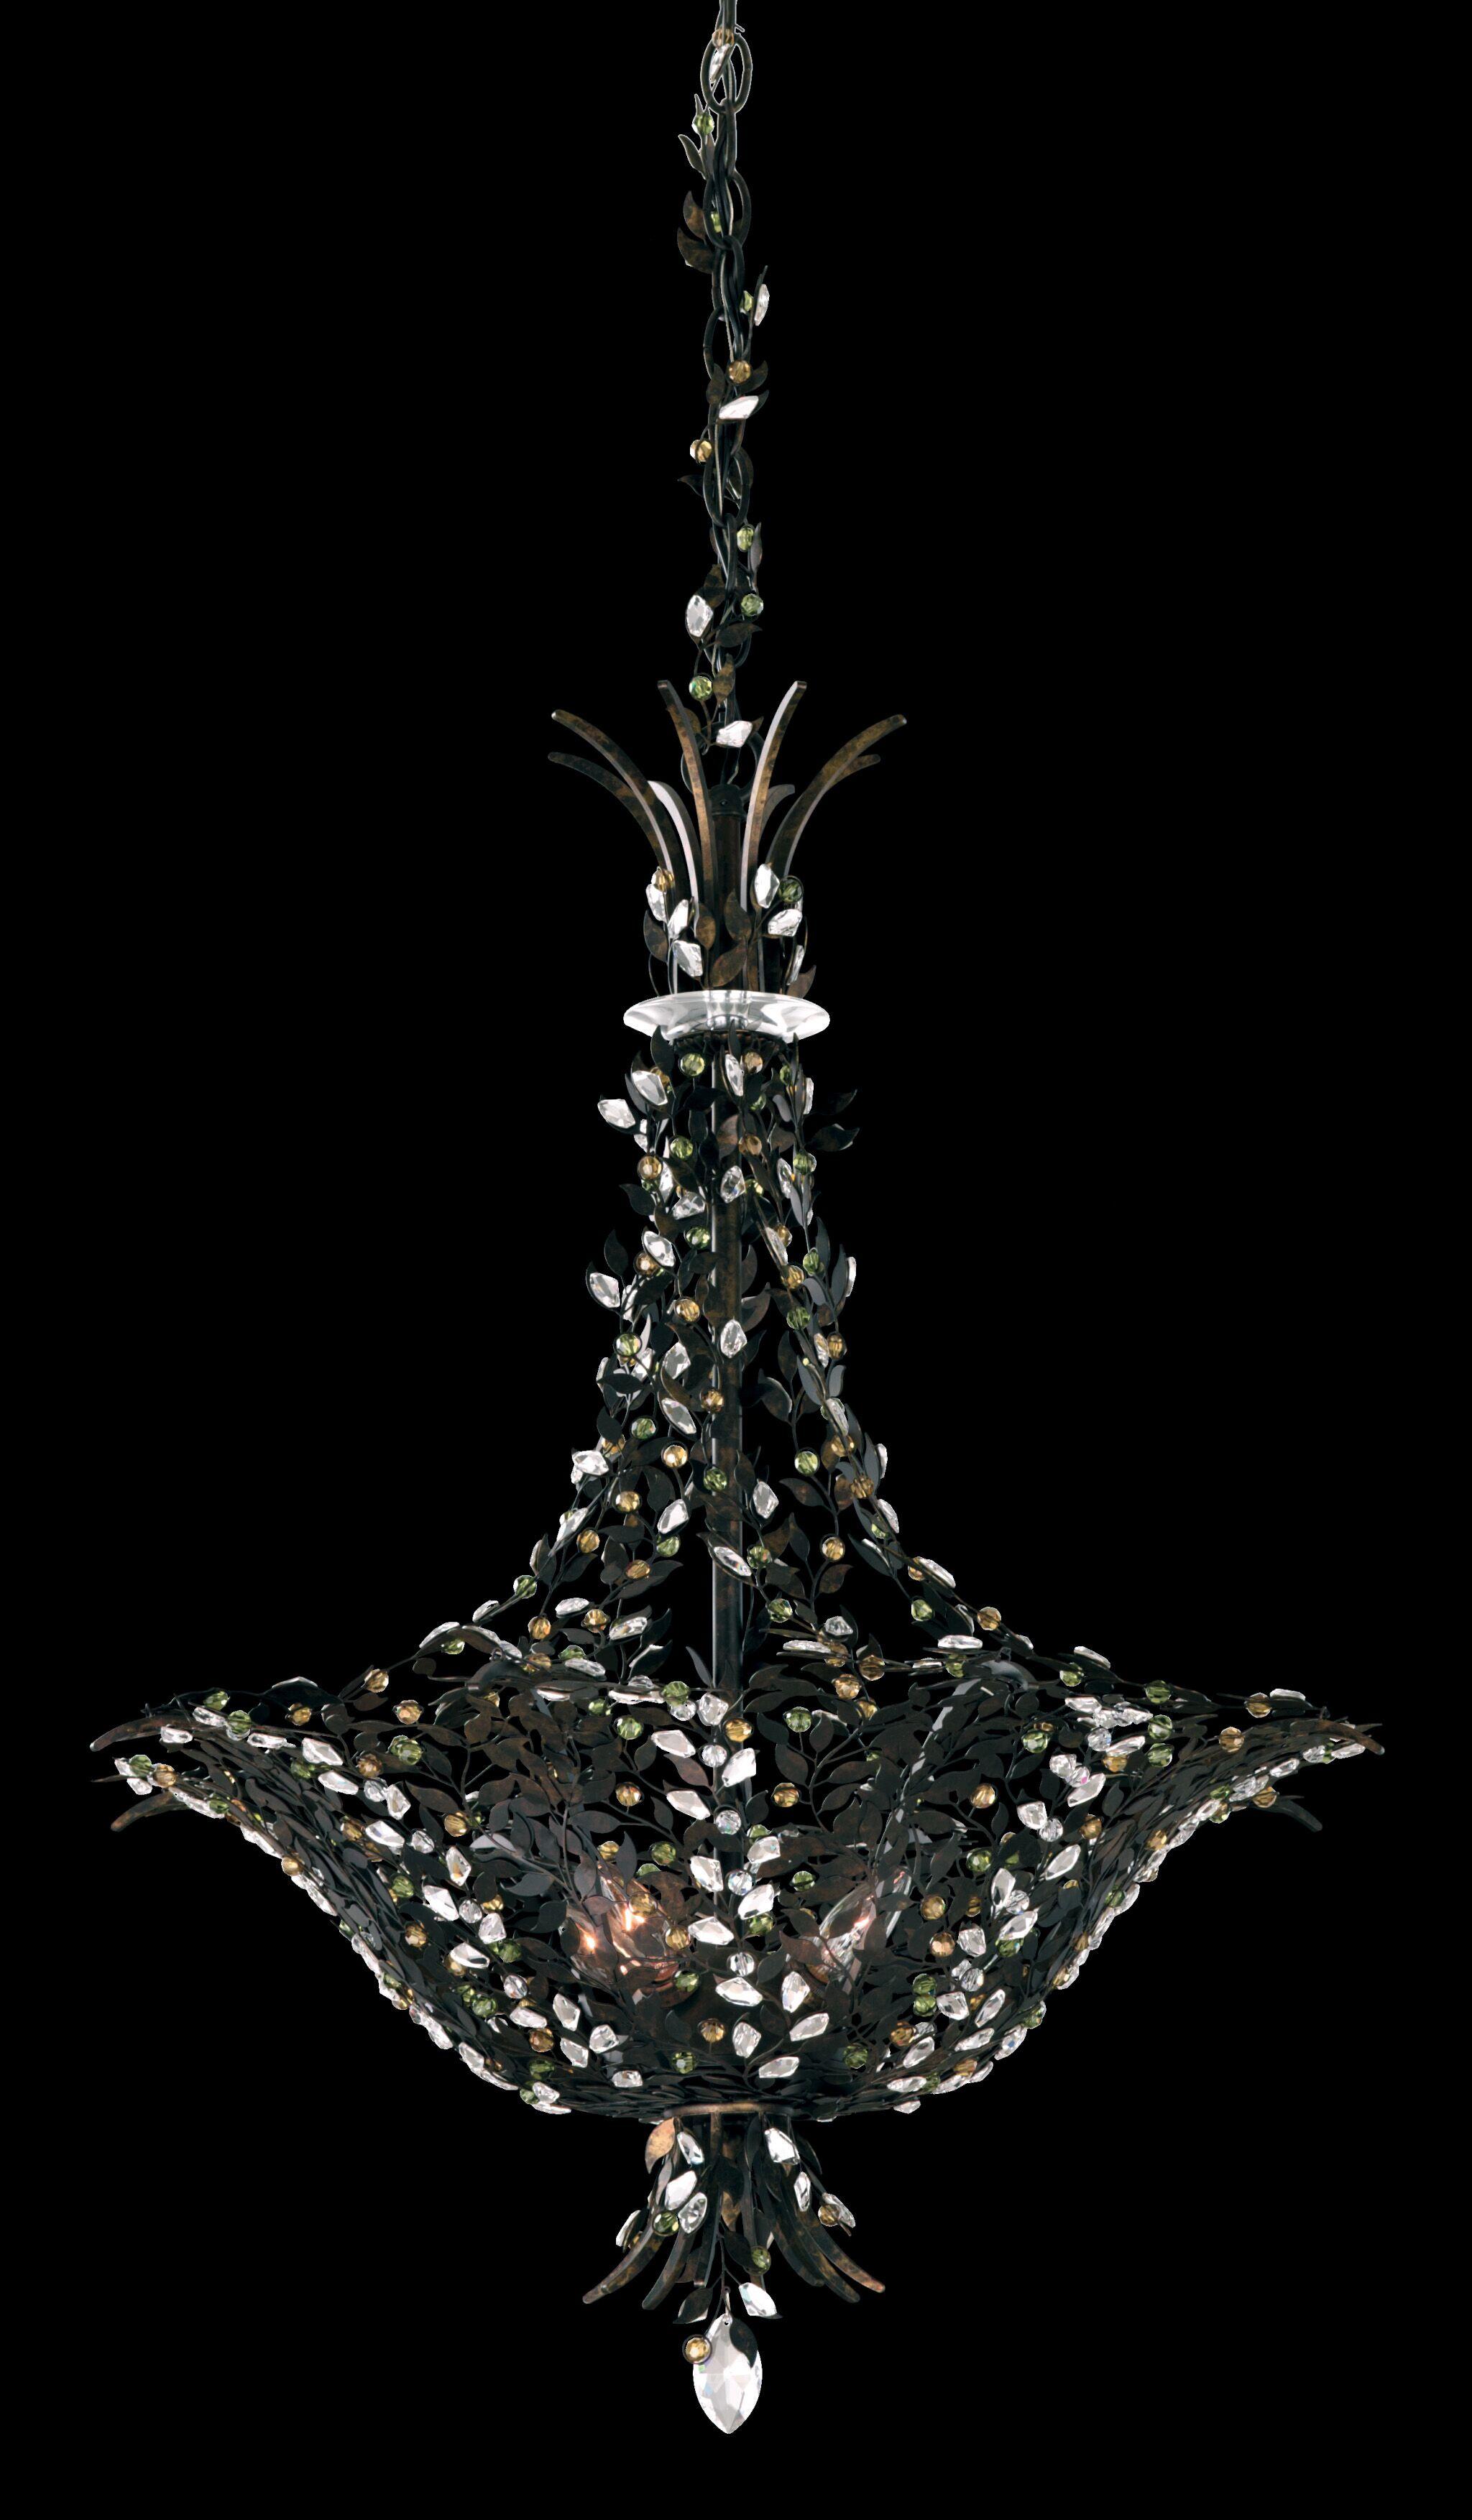 Amytis 4-Light Empire Chandelier Finish: Heirloom Gold, Crystal Type: Swarovski Elements Ray